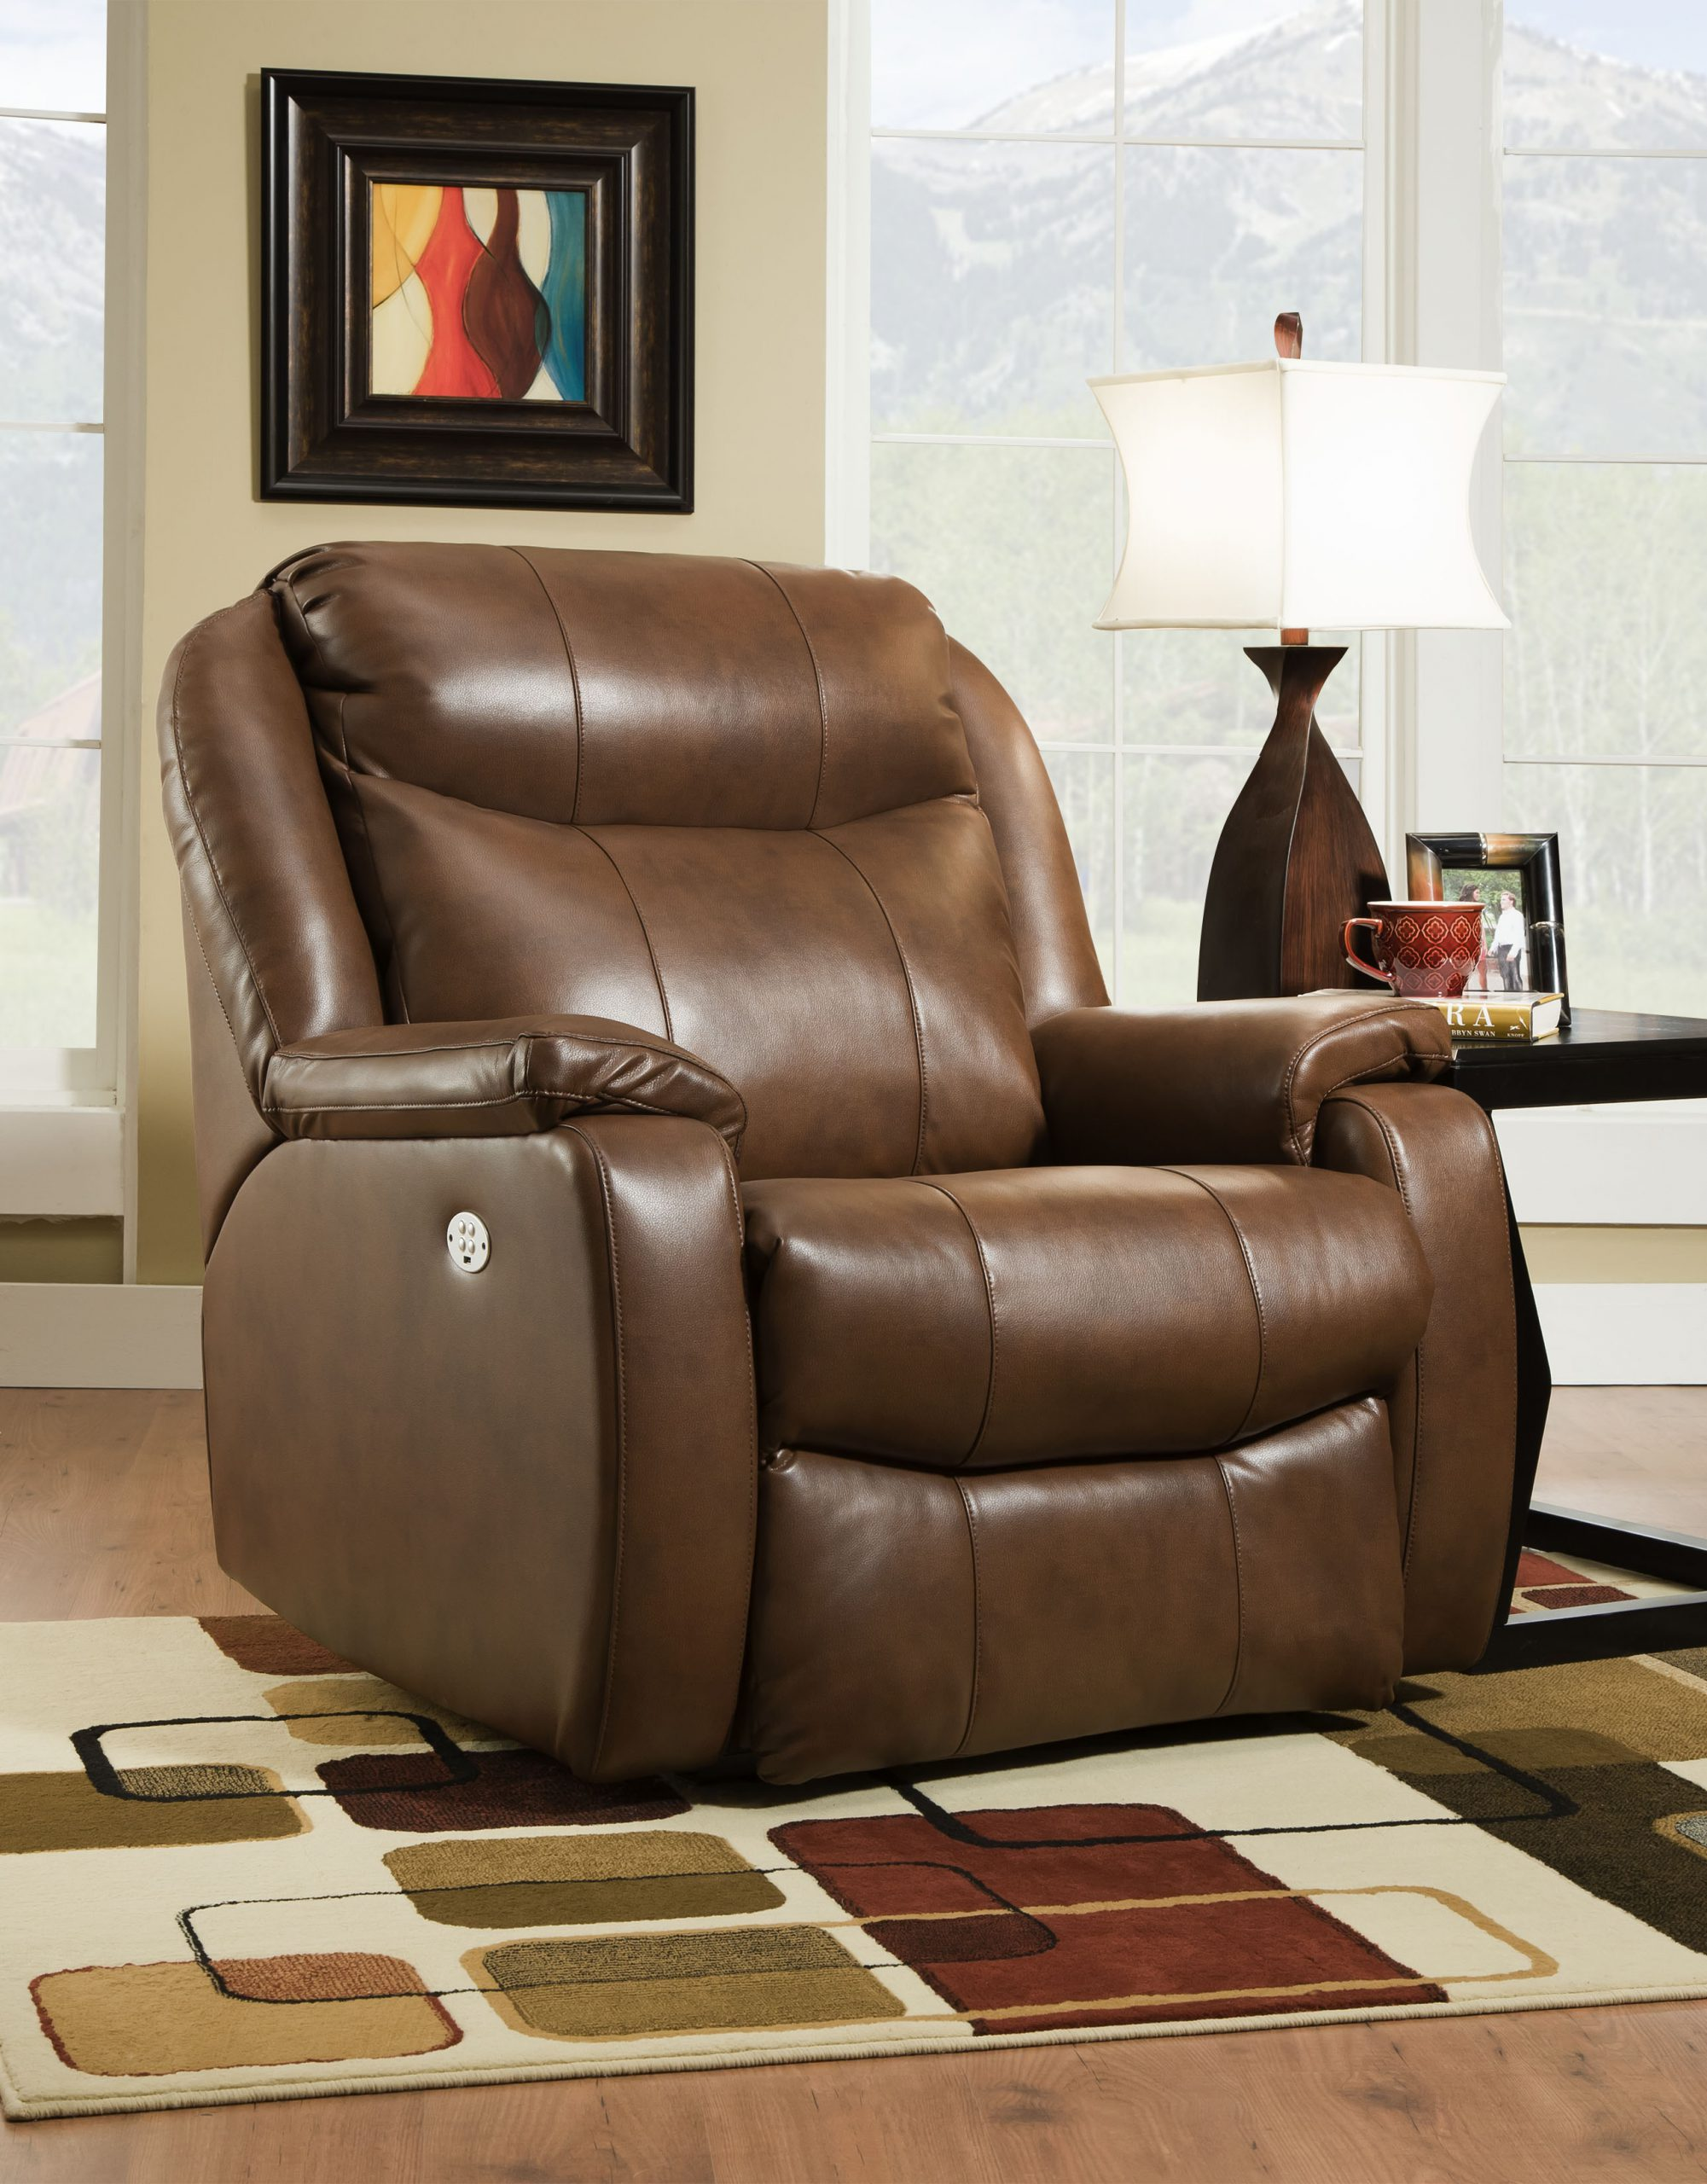 6240p-6240p-big-mans-in-243-17-kobe-cognac-room-scene-090415-scaled